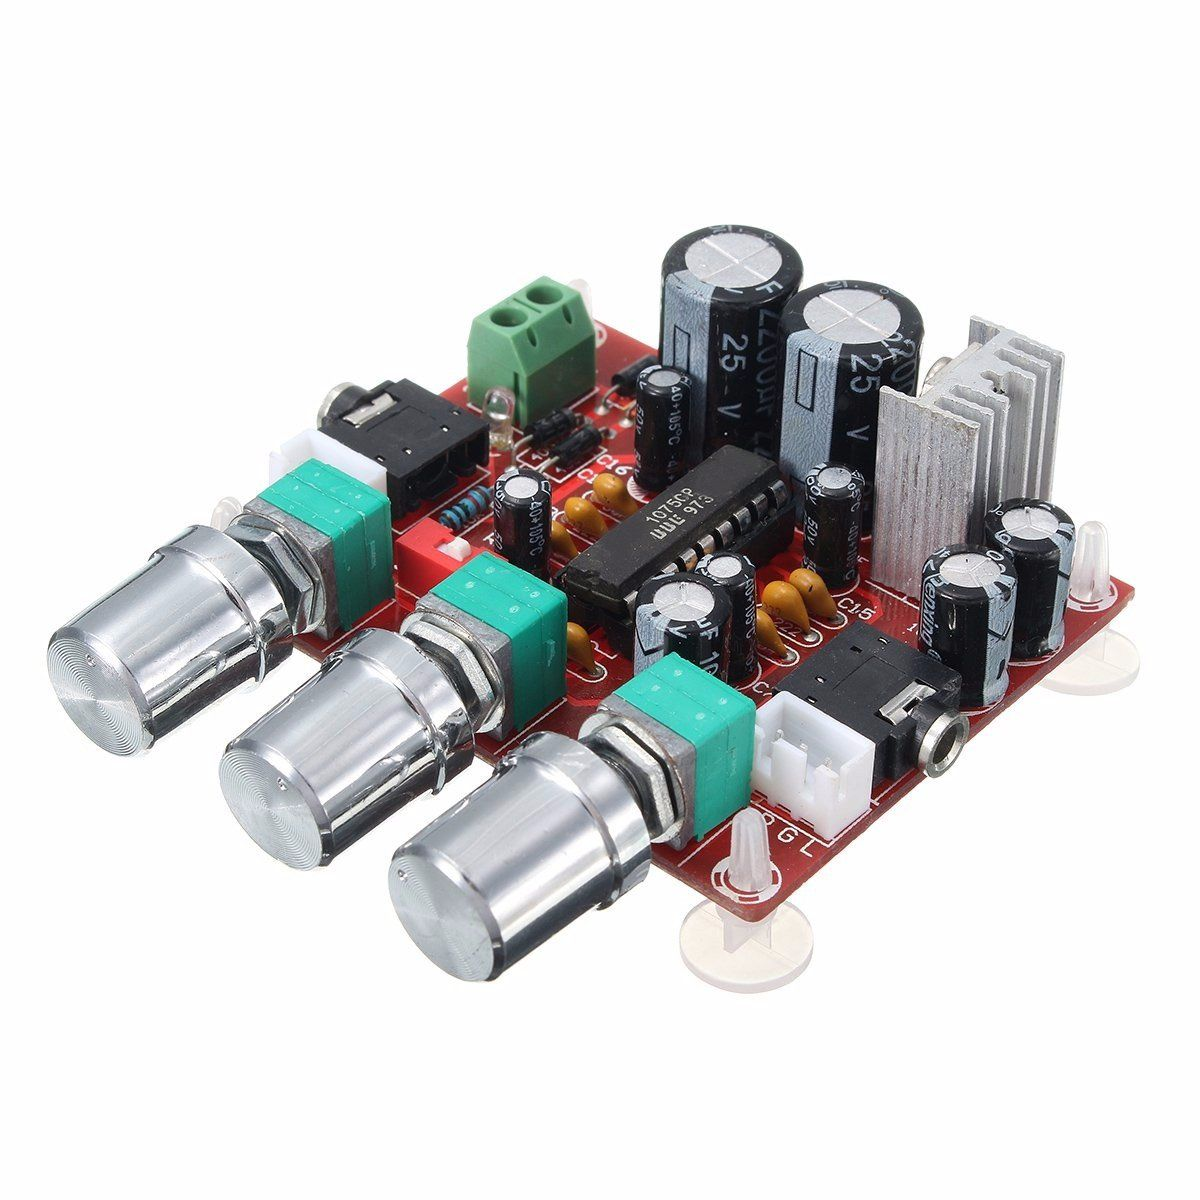 XR1075 Tone Board BBE Digital Audio Processor Exciter For Pre-amplifier Module